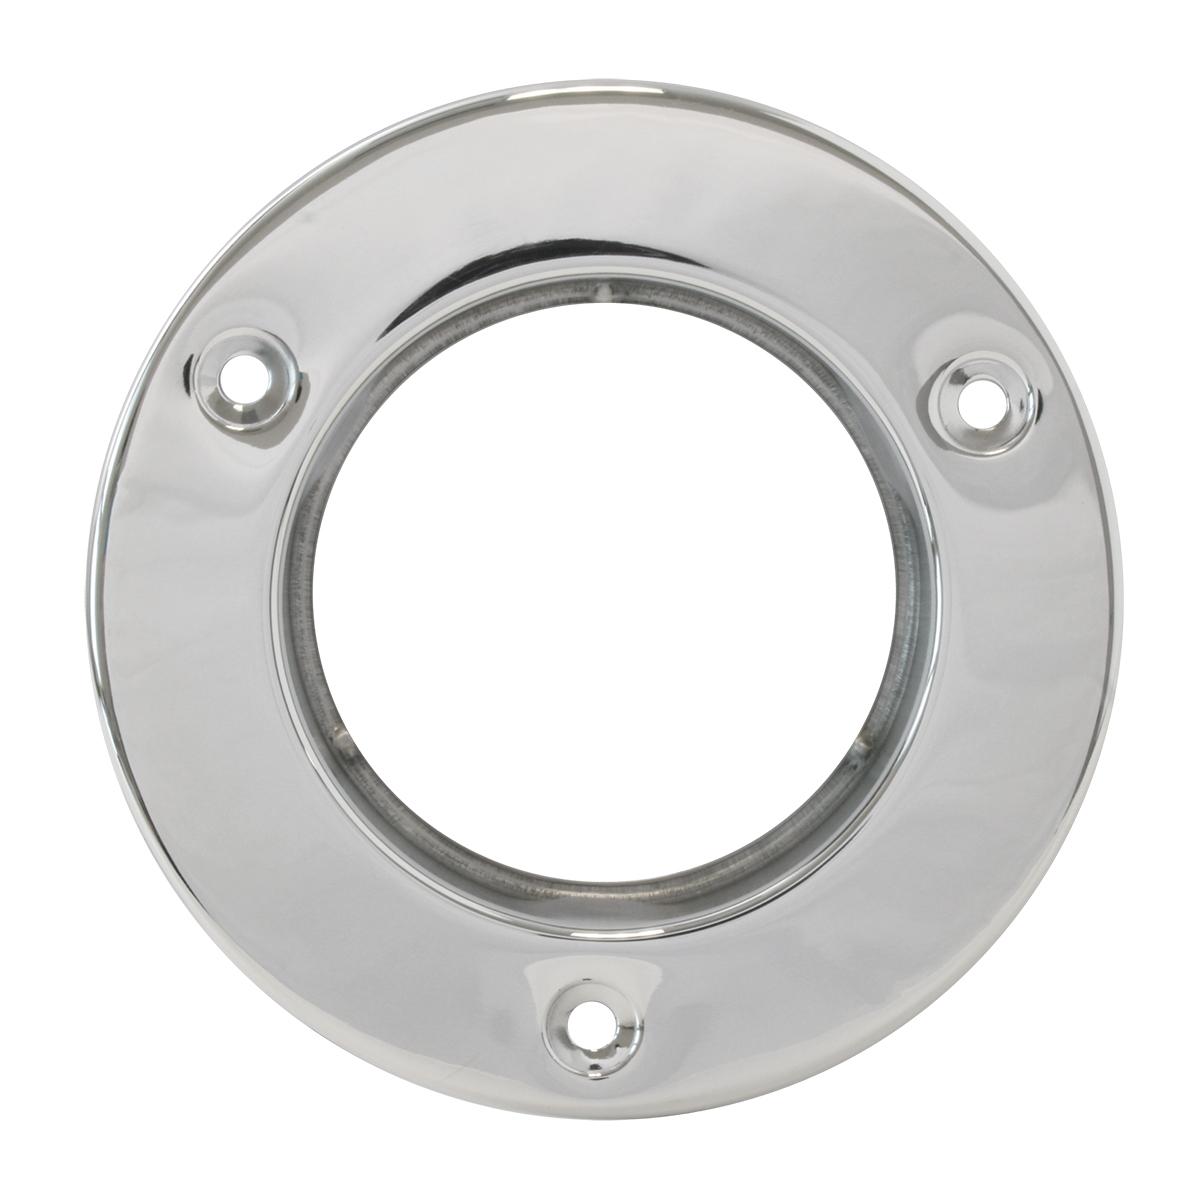 "87148 Stainless Steel Flange Mount Bezel for 2-1/2"" Round Light"